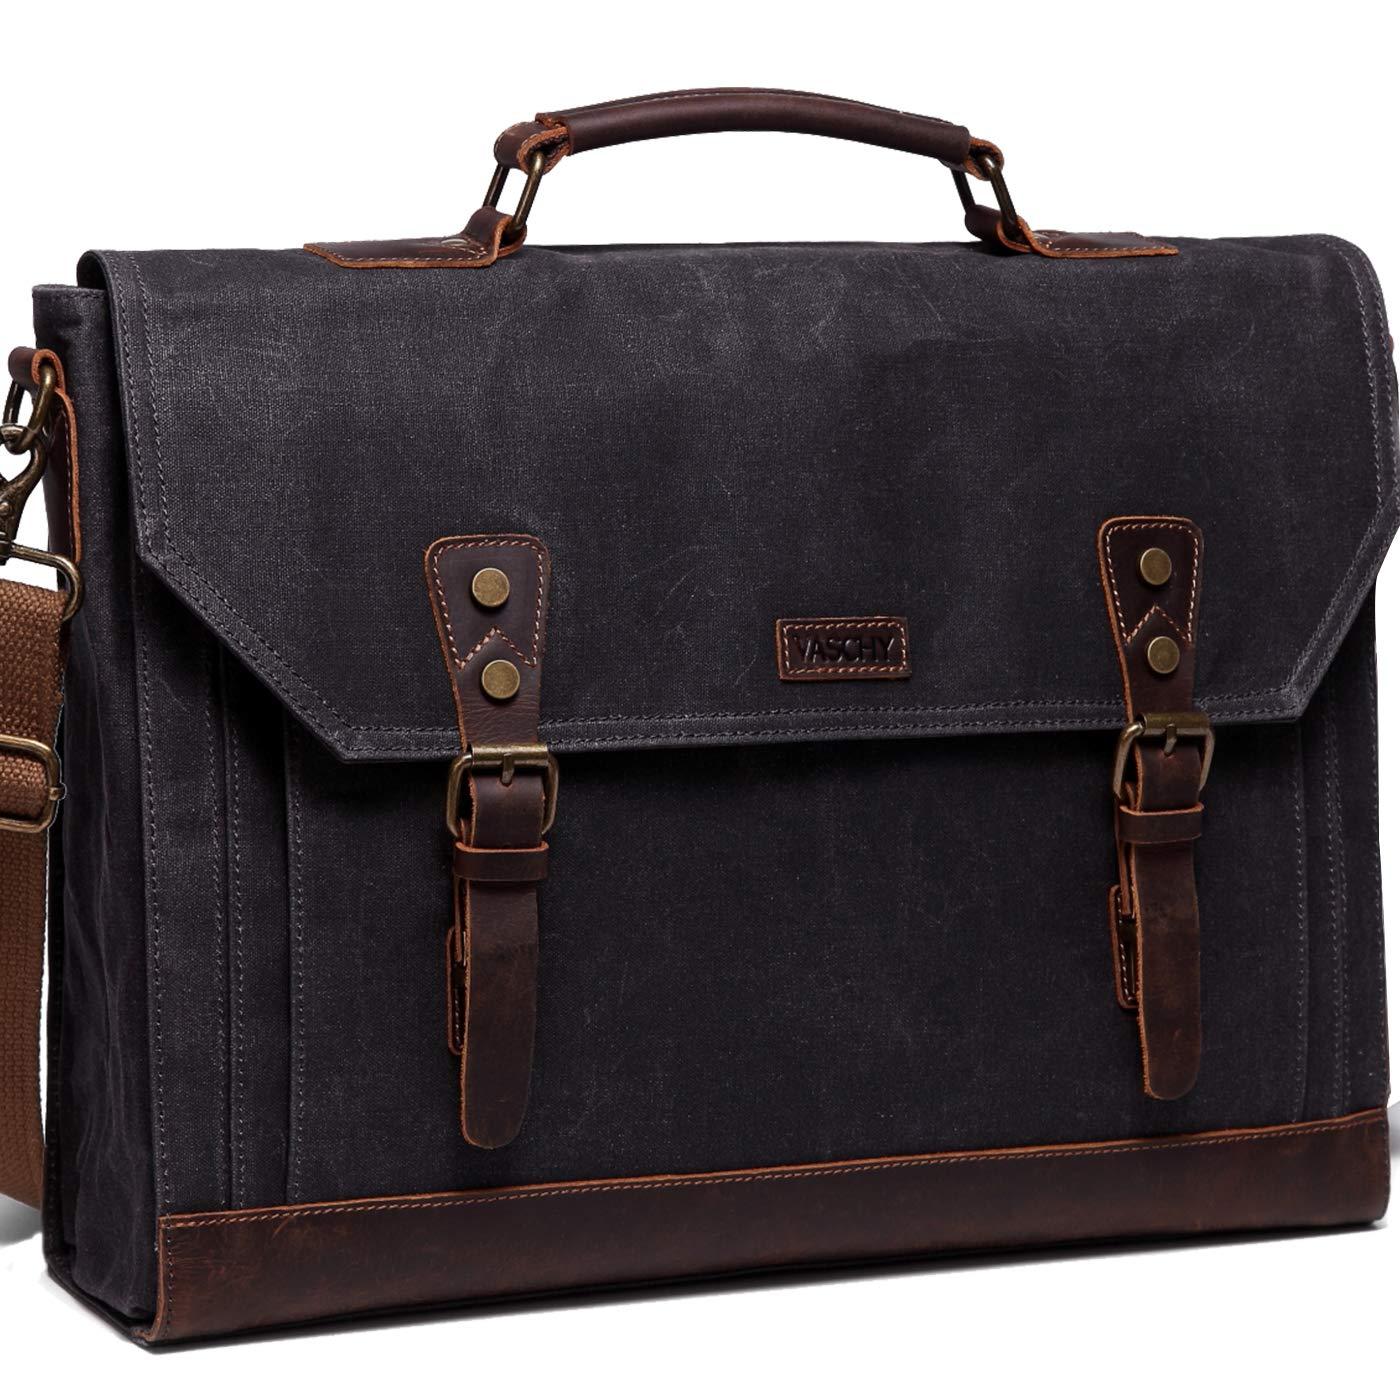 17 inch Laptop Messenger Bag,Vaschy Vintage Waxed Canvas Leather Water Resistant Mens Satchel Briefcase Bag Business Shoulder Bag Gray